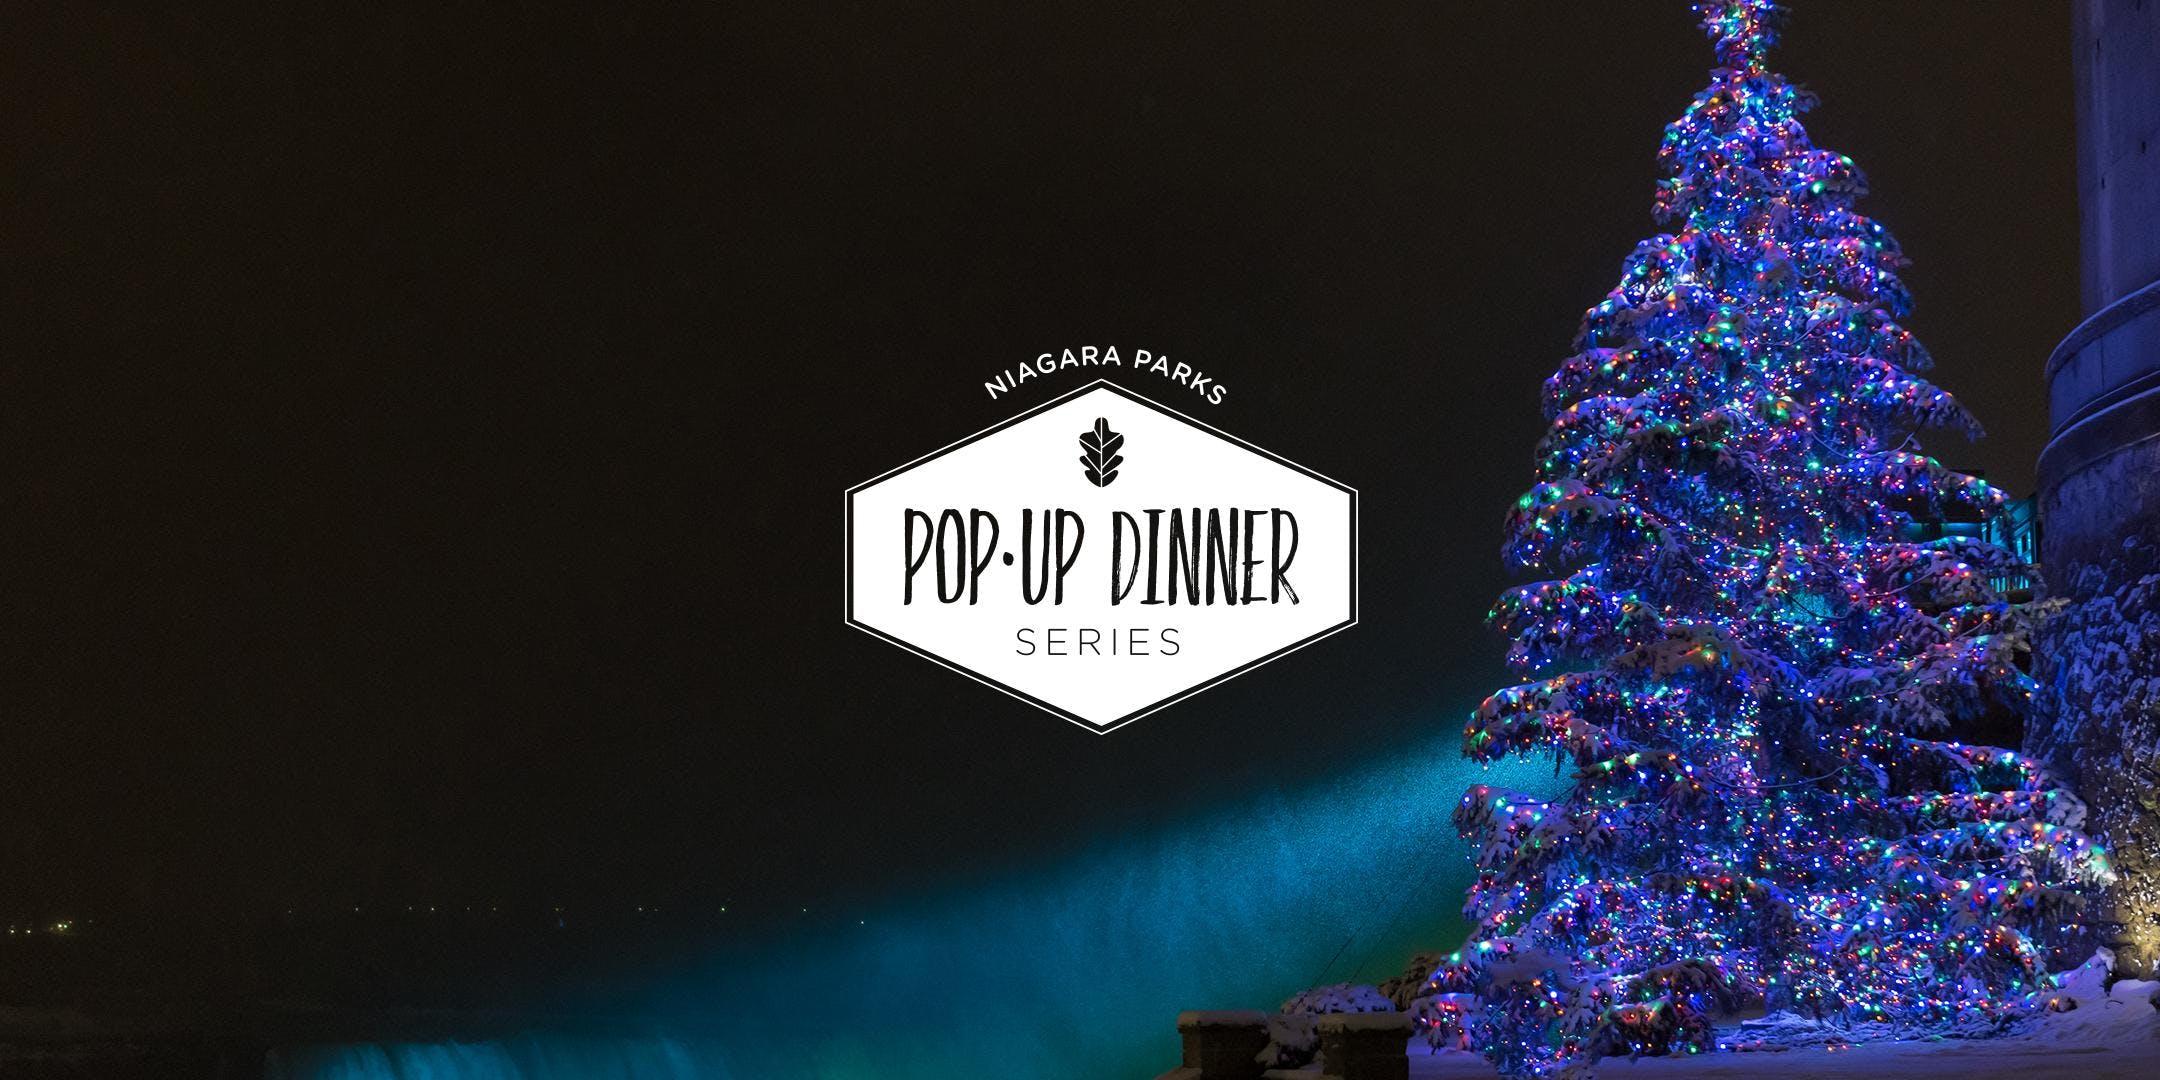 Pop-up Dinner Series: Queen Victoria Place